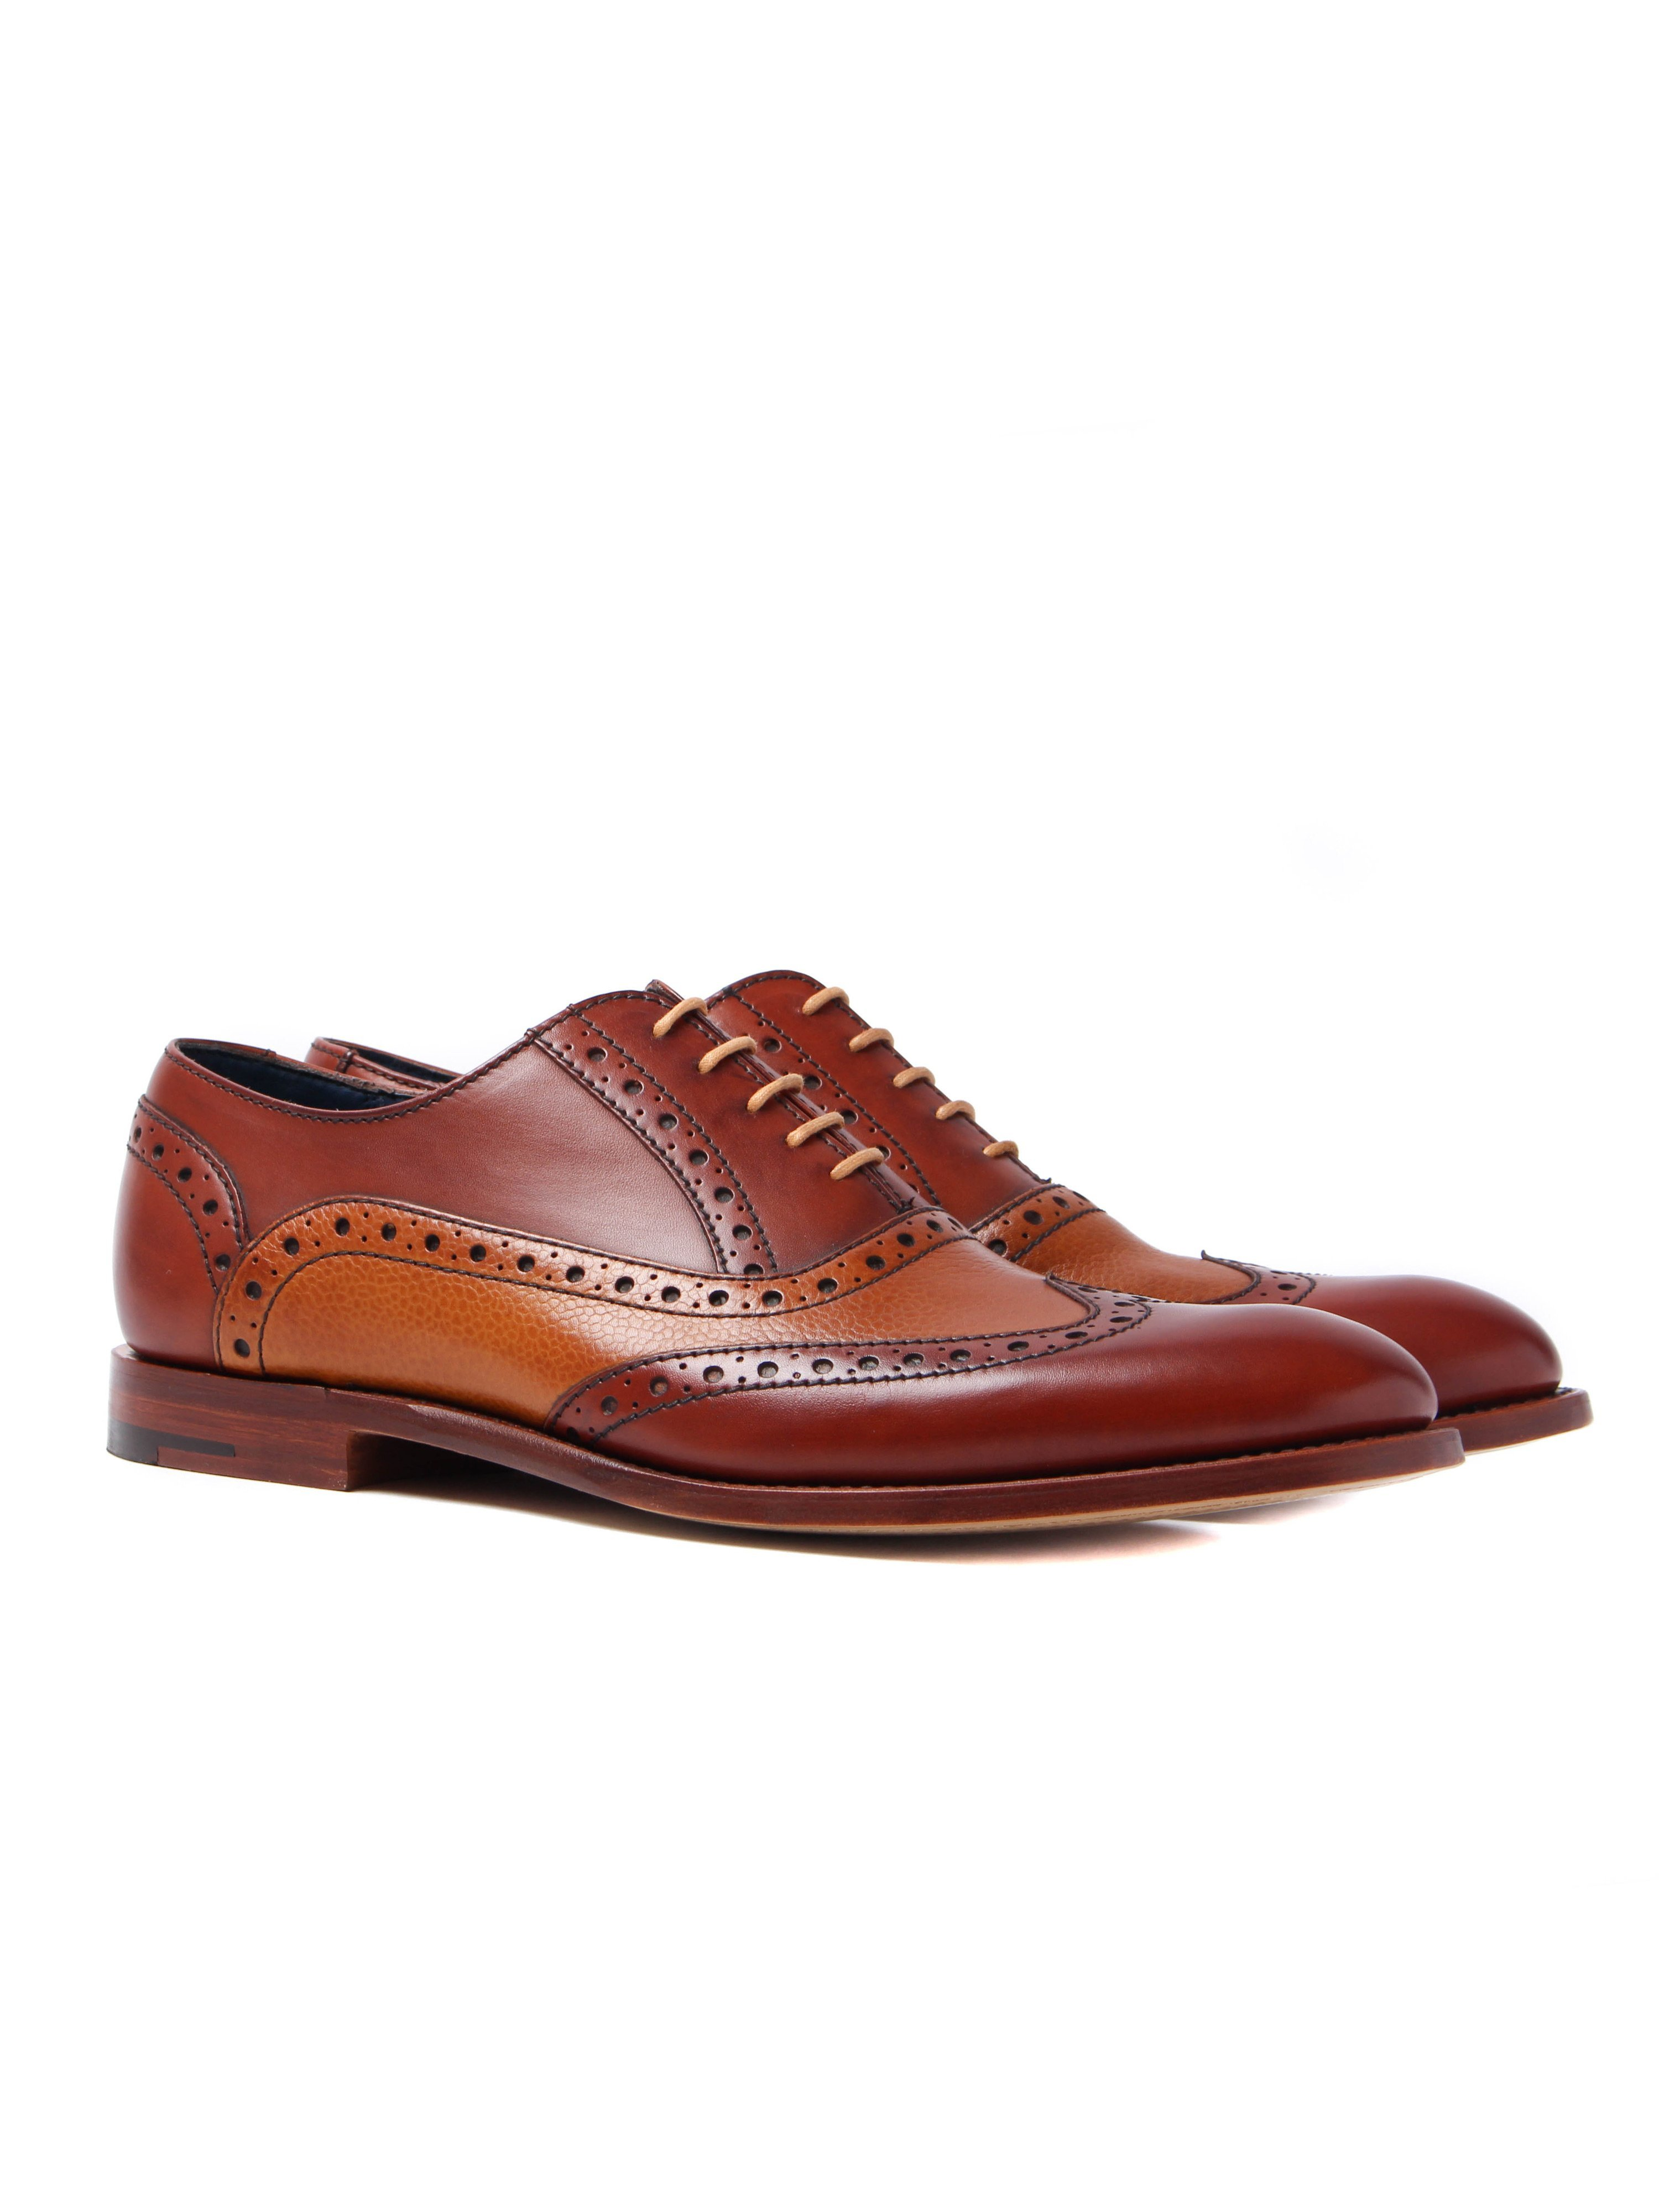 Barker Men's Grant Leather Oxford Brogues - Rosewood & Cedar